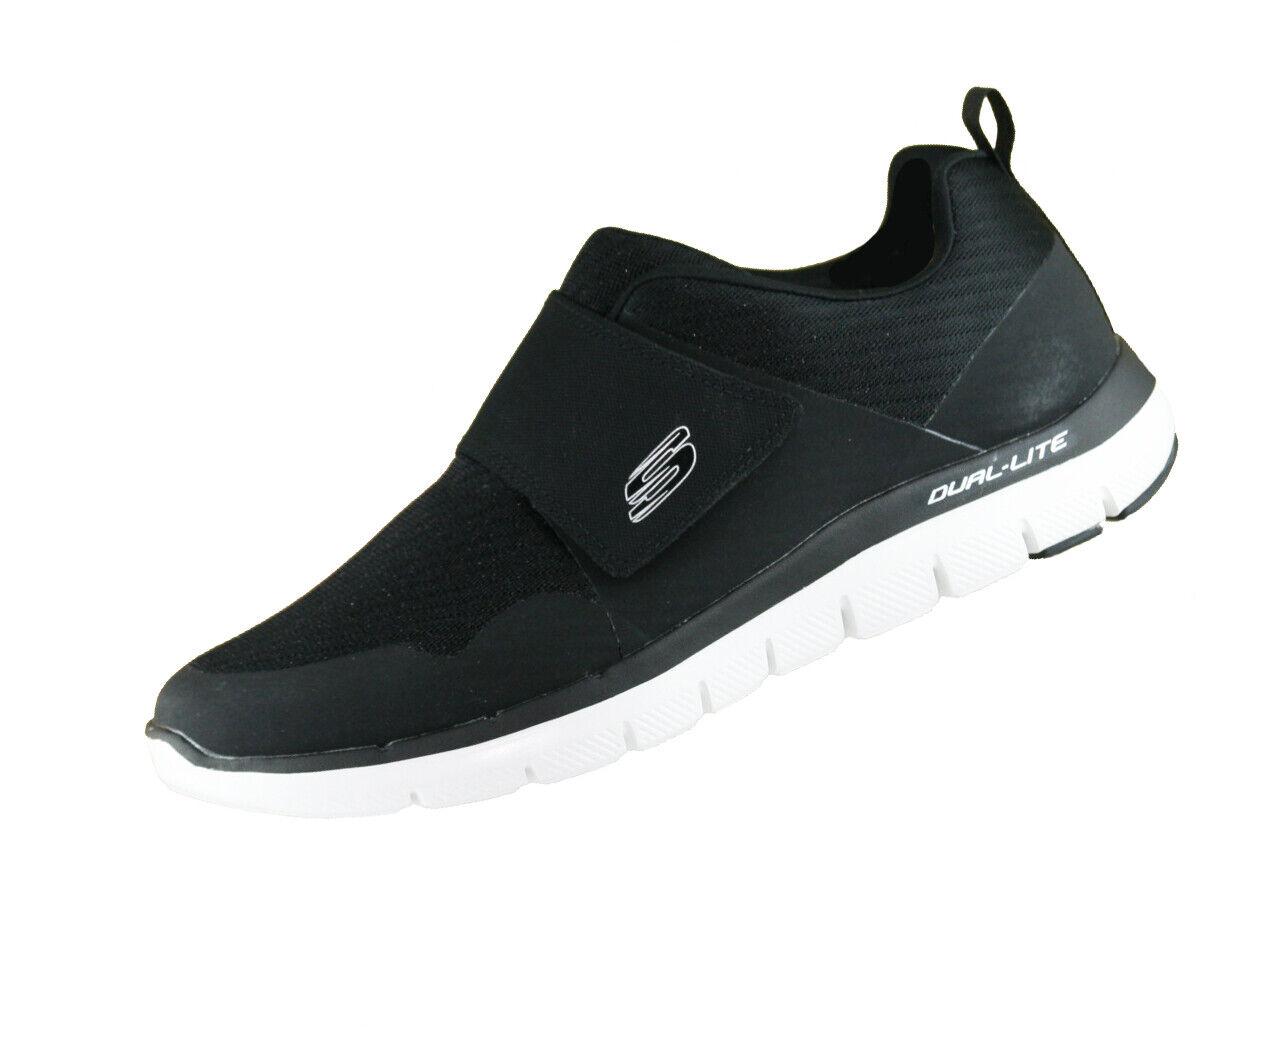 Skechers Flex advantage 52183 negro bkw memory foam velcro calcetines cortos nuevo